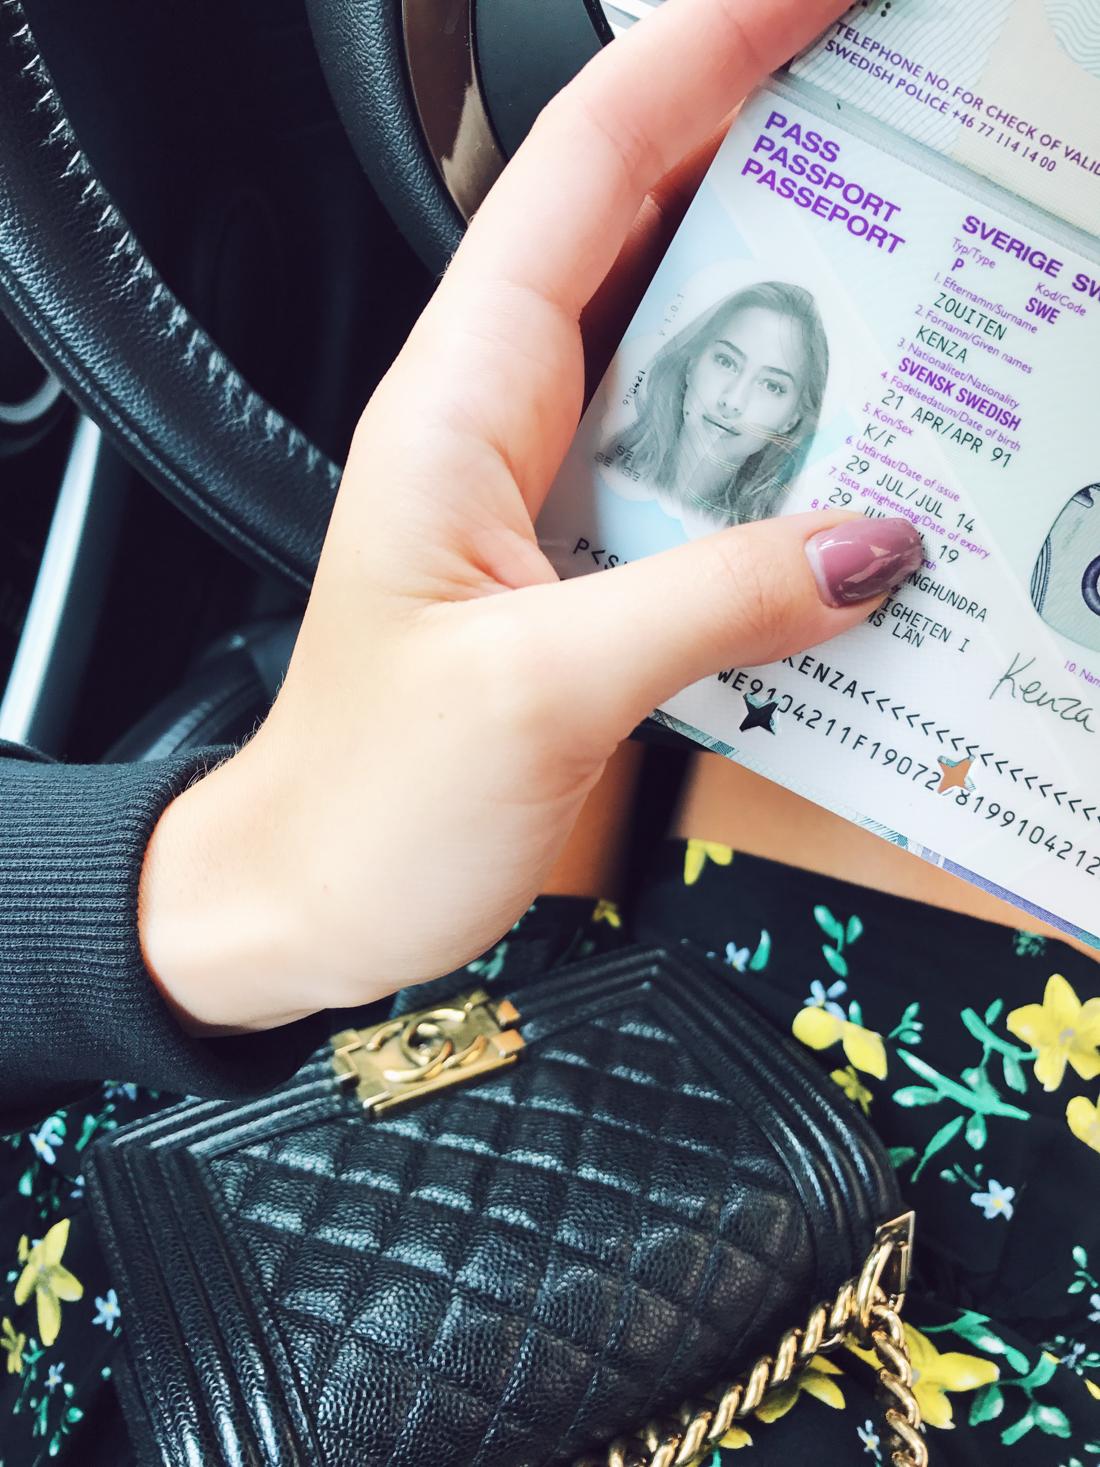 byta efternamn giftermål pass